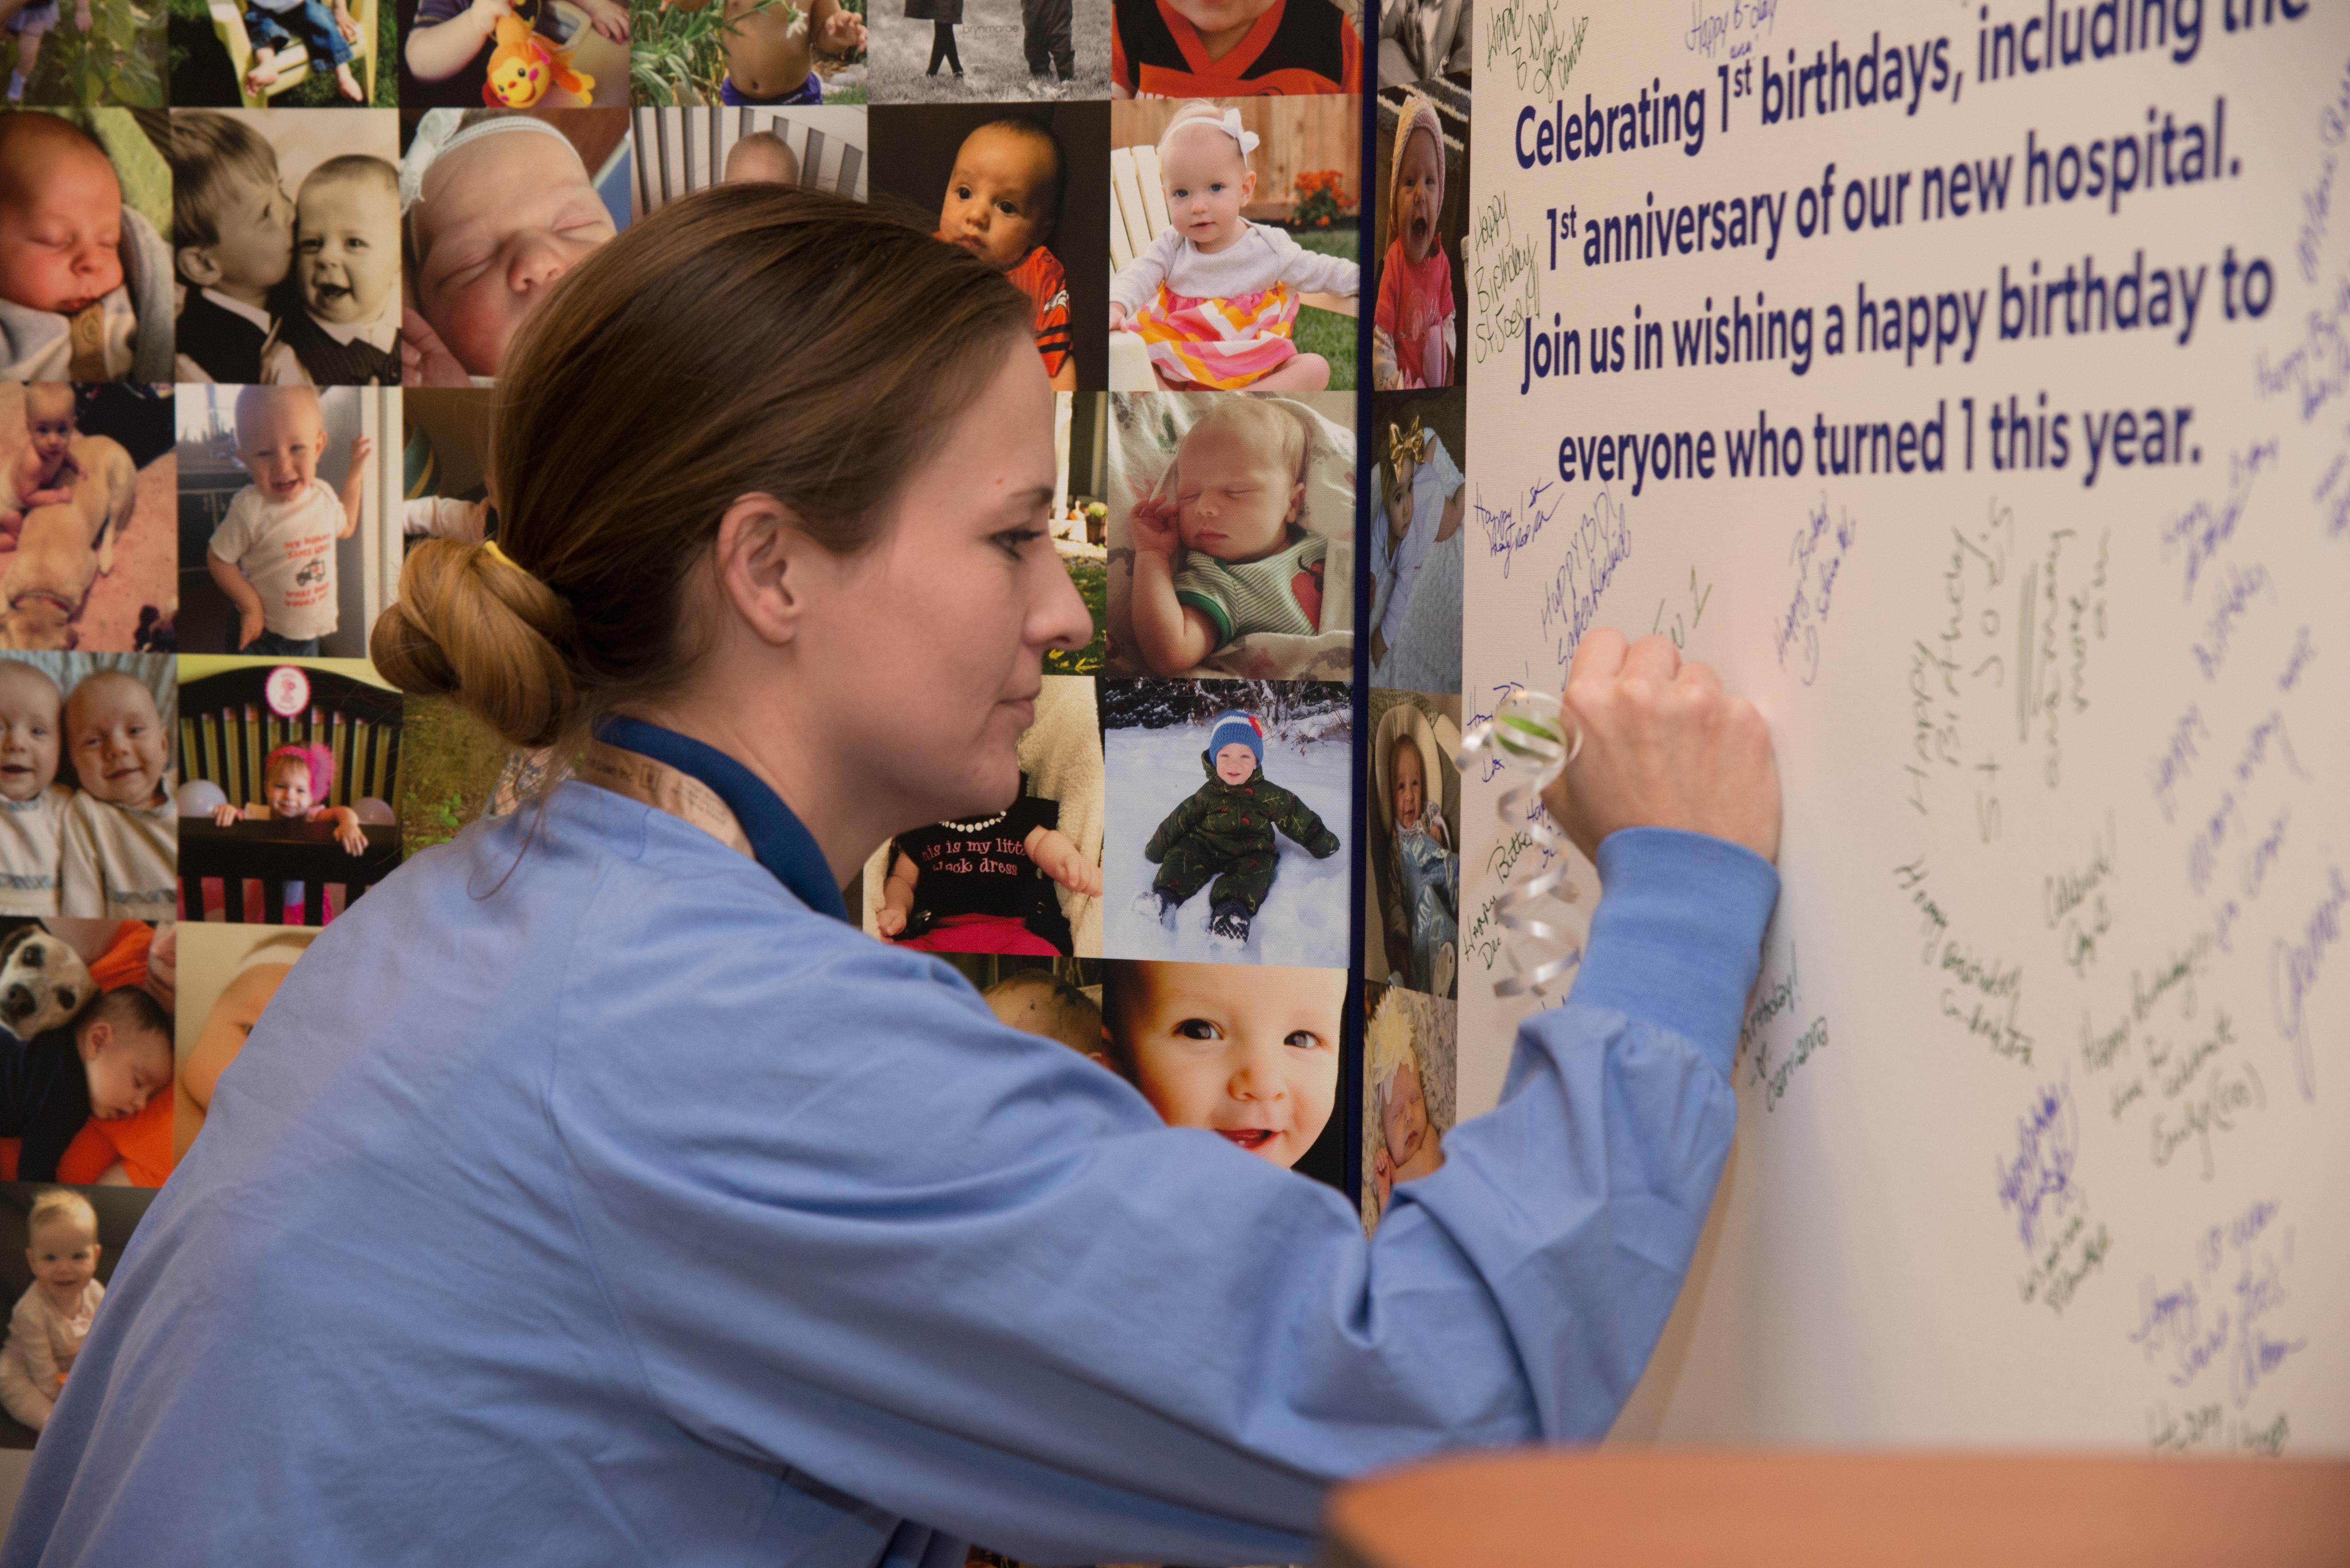 Saint joseph hospital celebrates one year anniversary in new